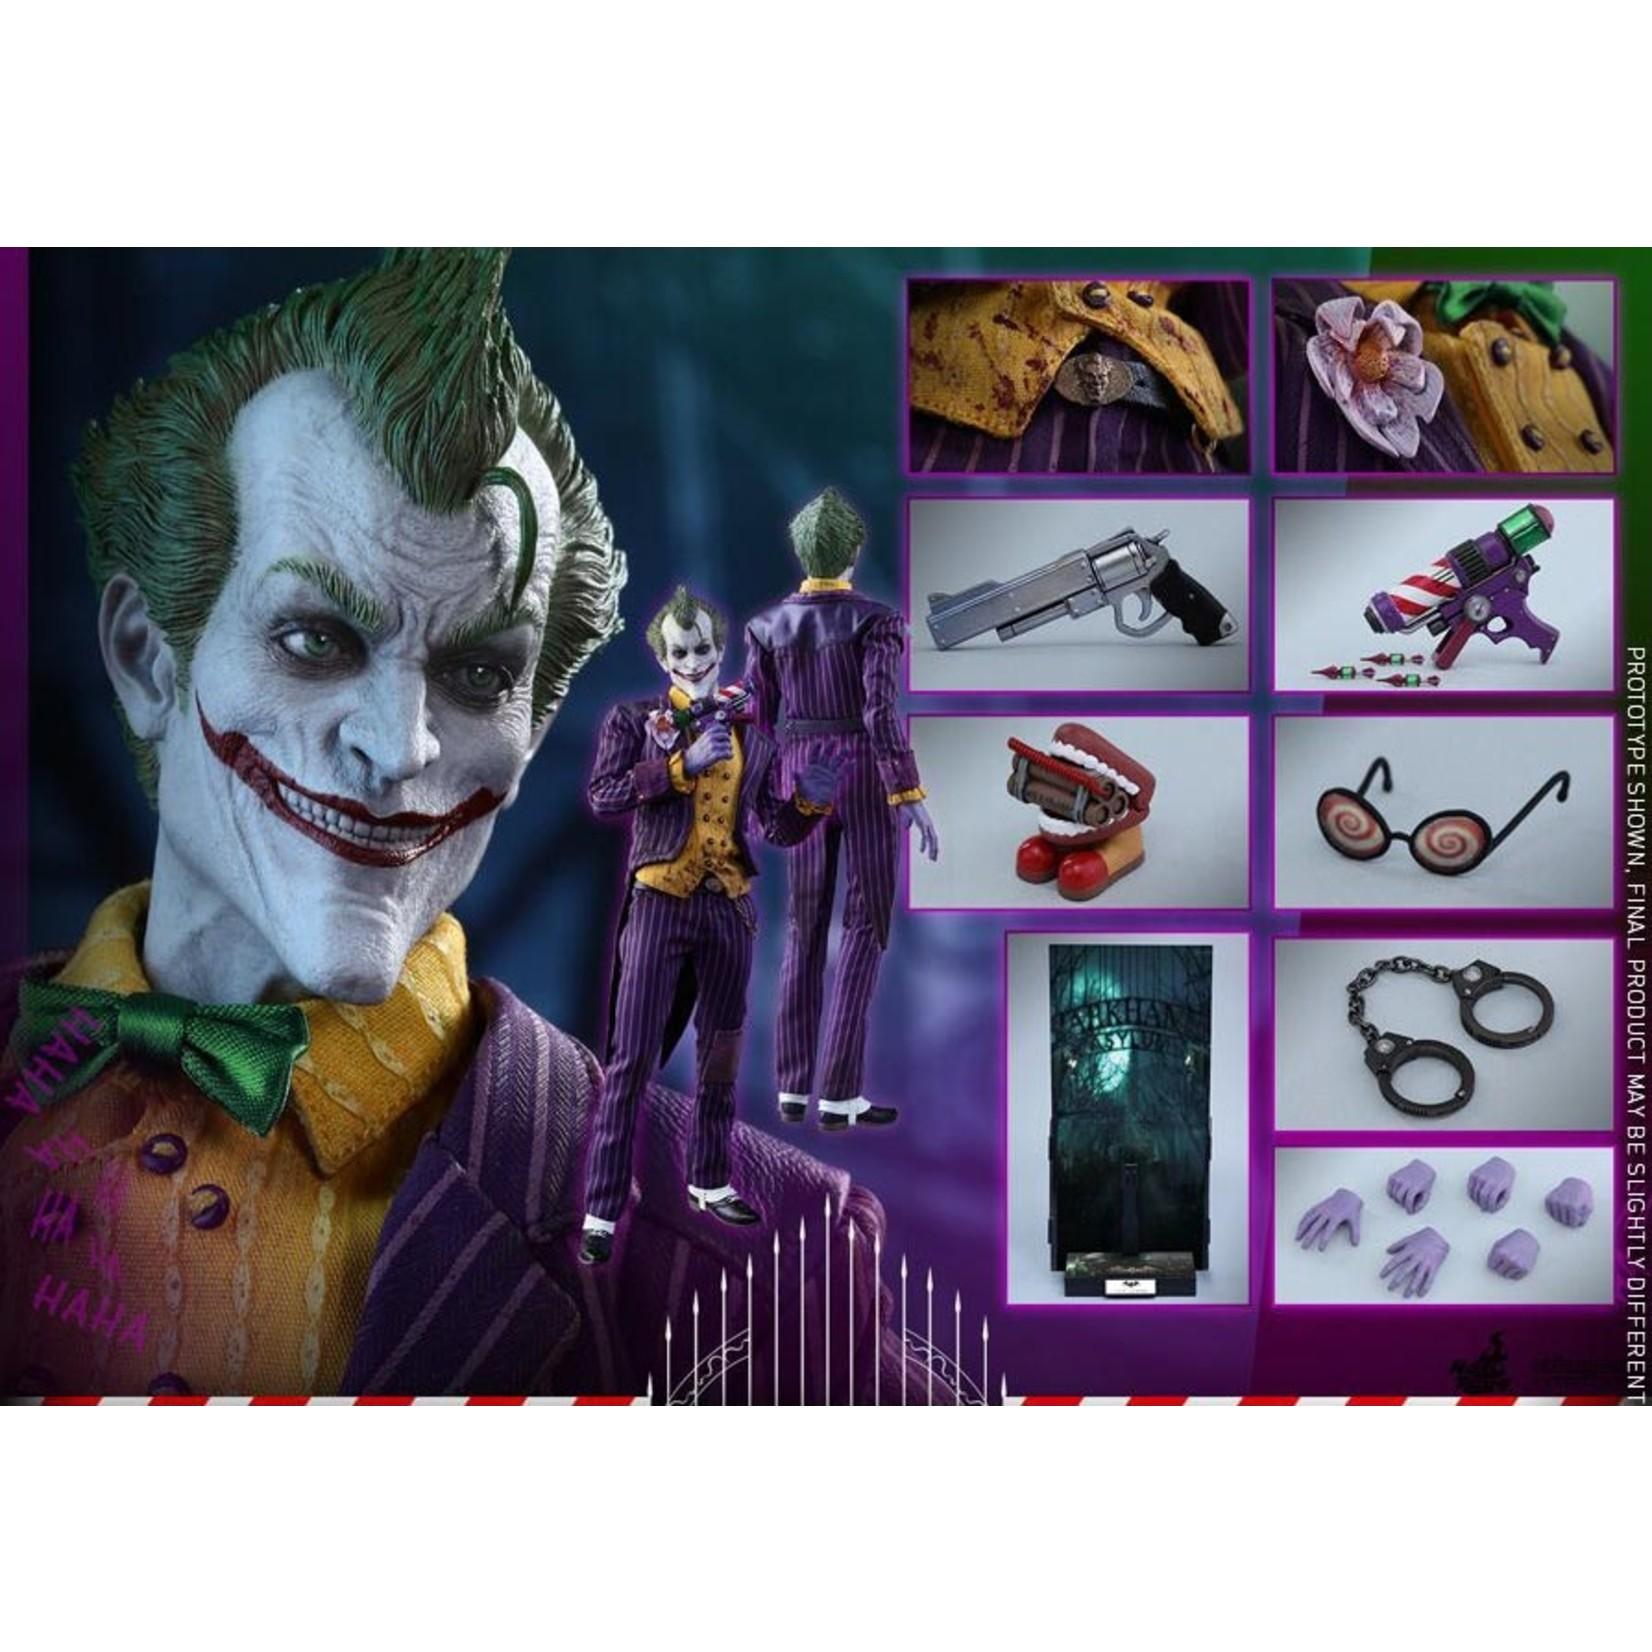 Hot Toys Arkham Asylum - The Joker VGM27